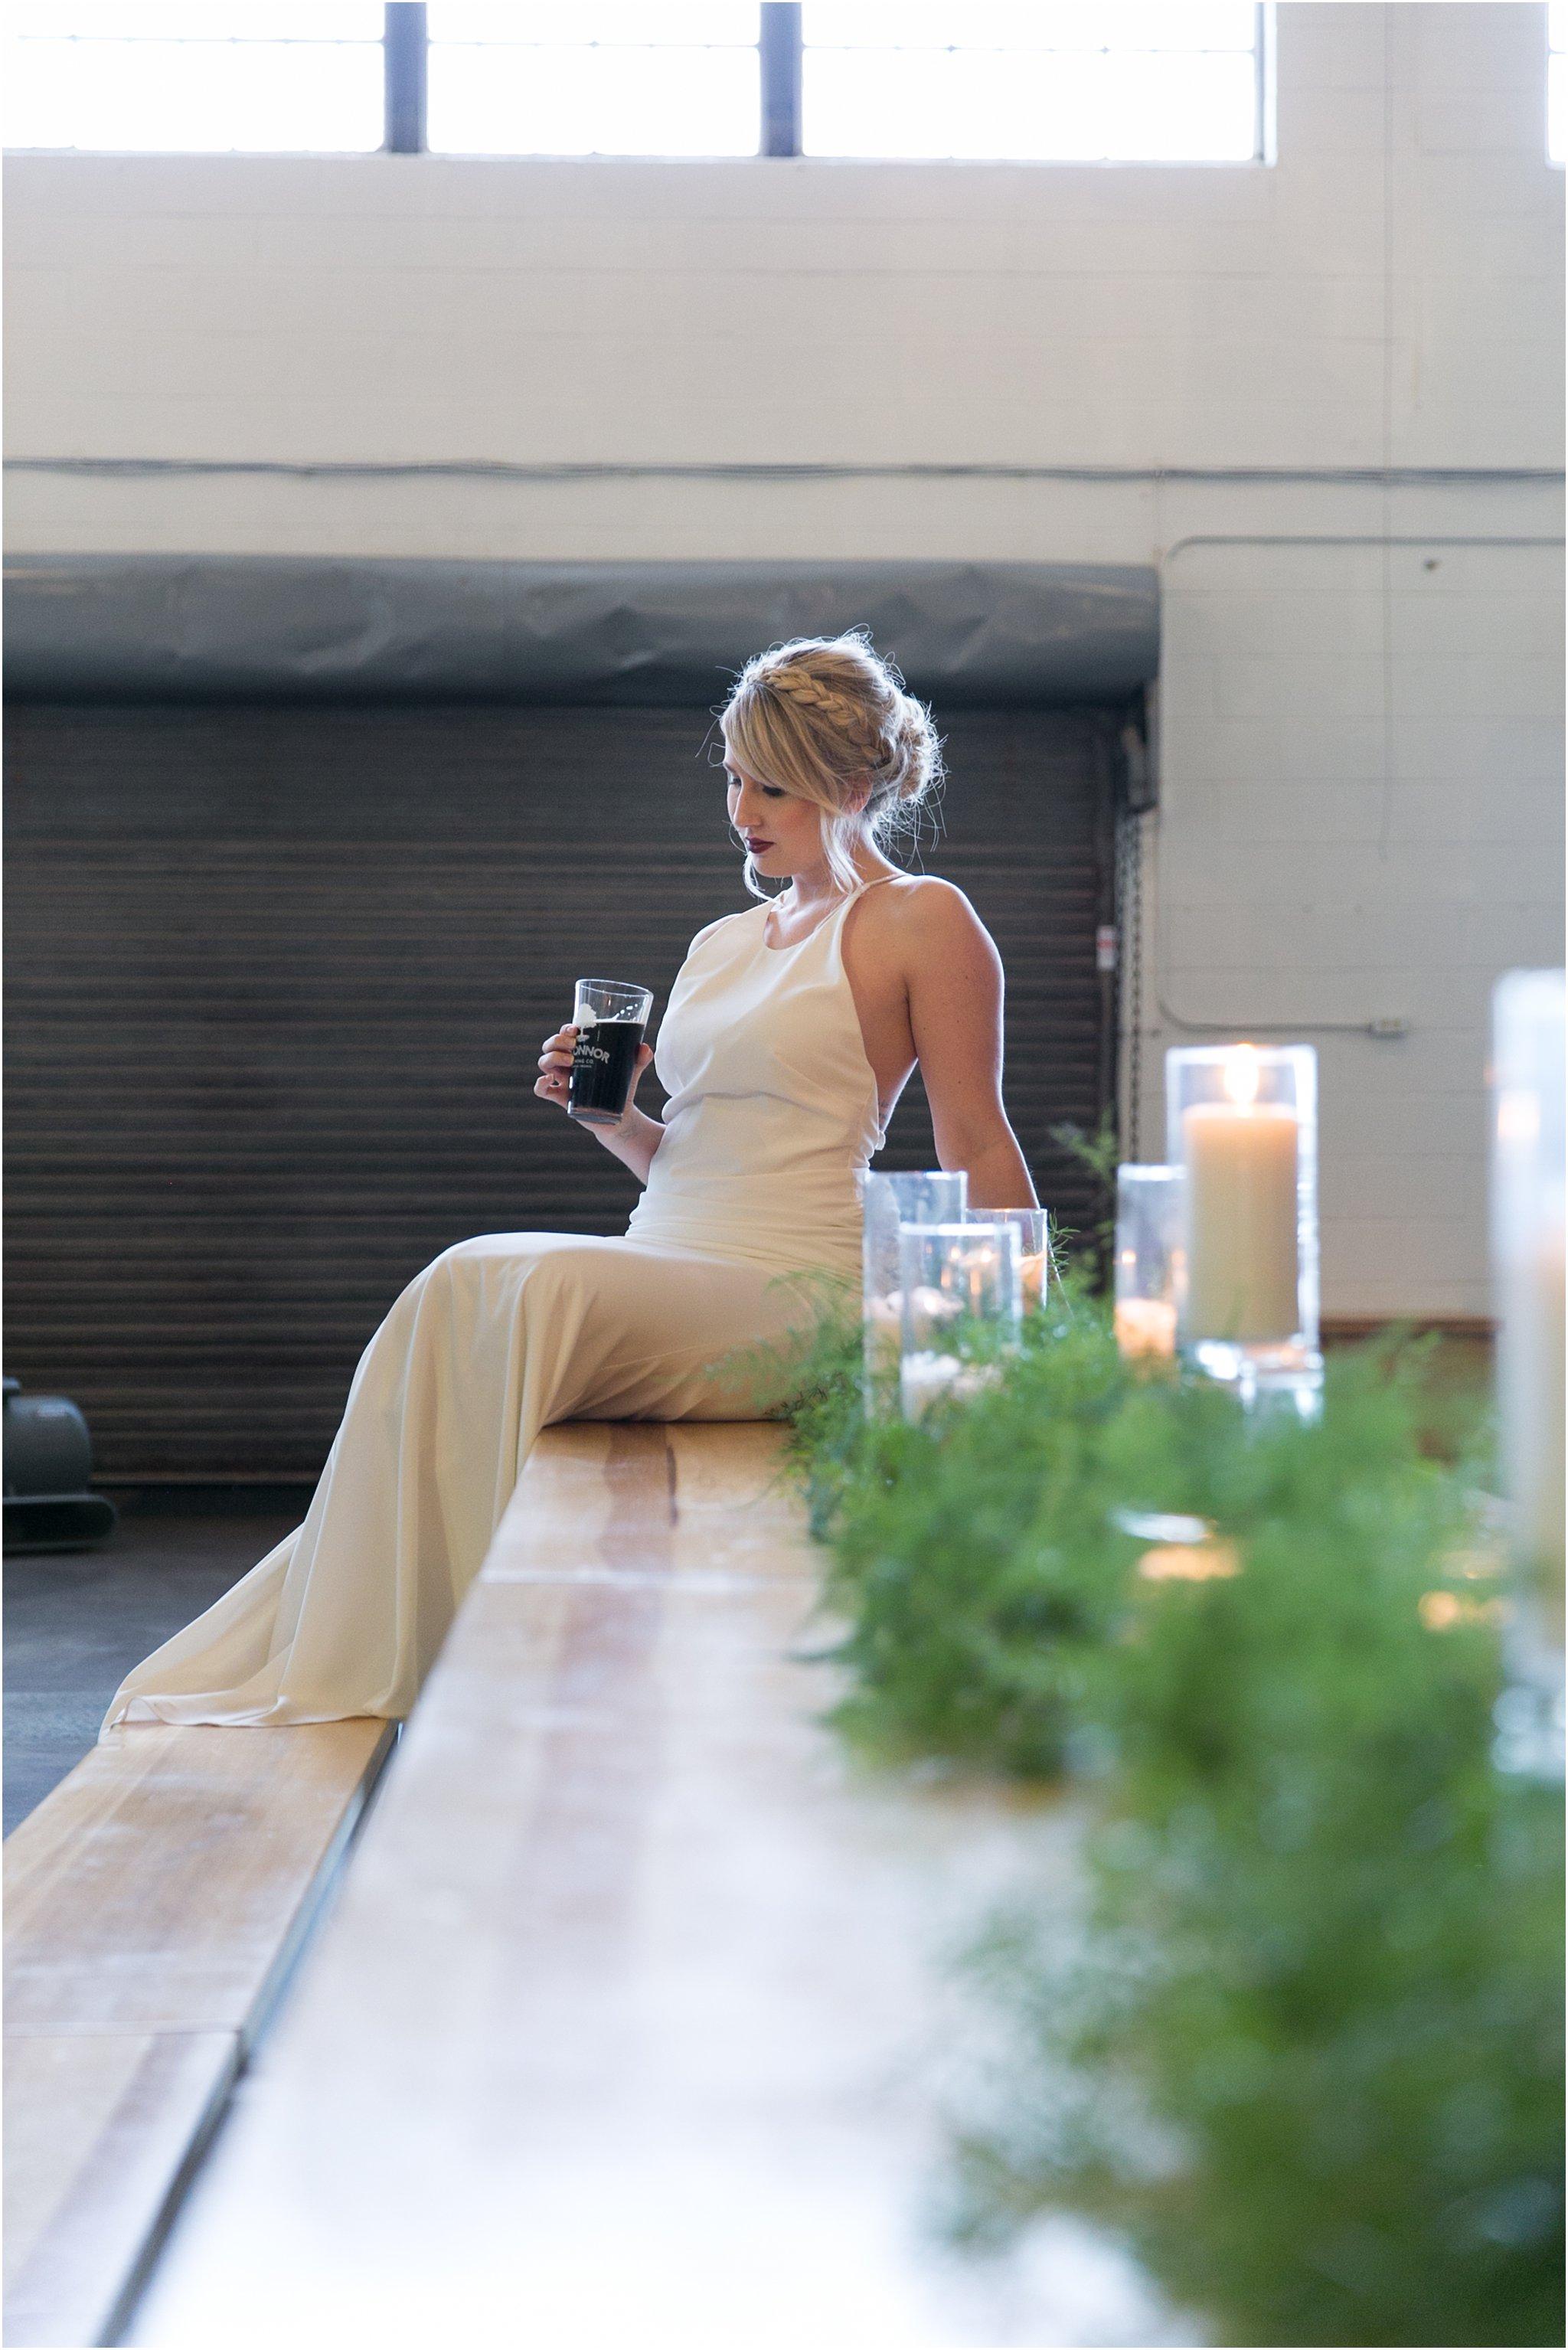 jessica_ryan_photography_oconnor_brewing_wedding_oconnor_brewing_co_norfolk_virginia_roost_flowers_blue_birds_garage__0824